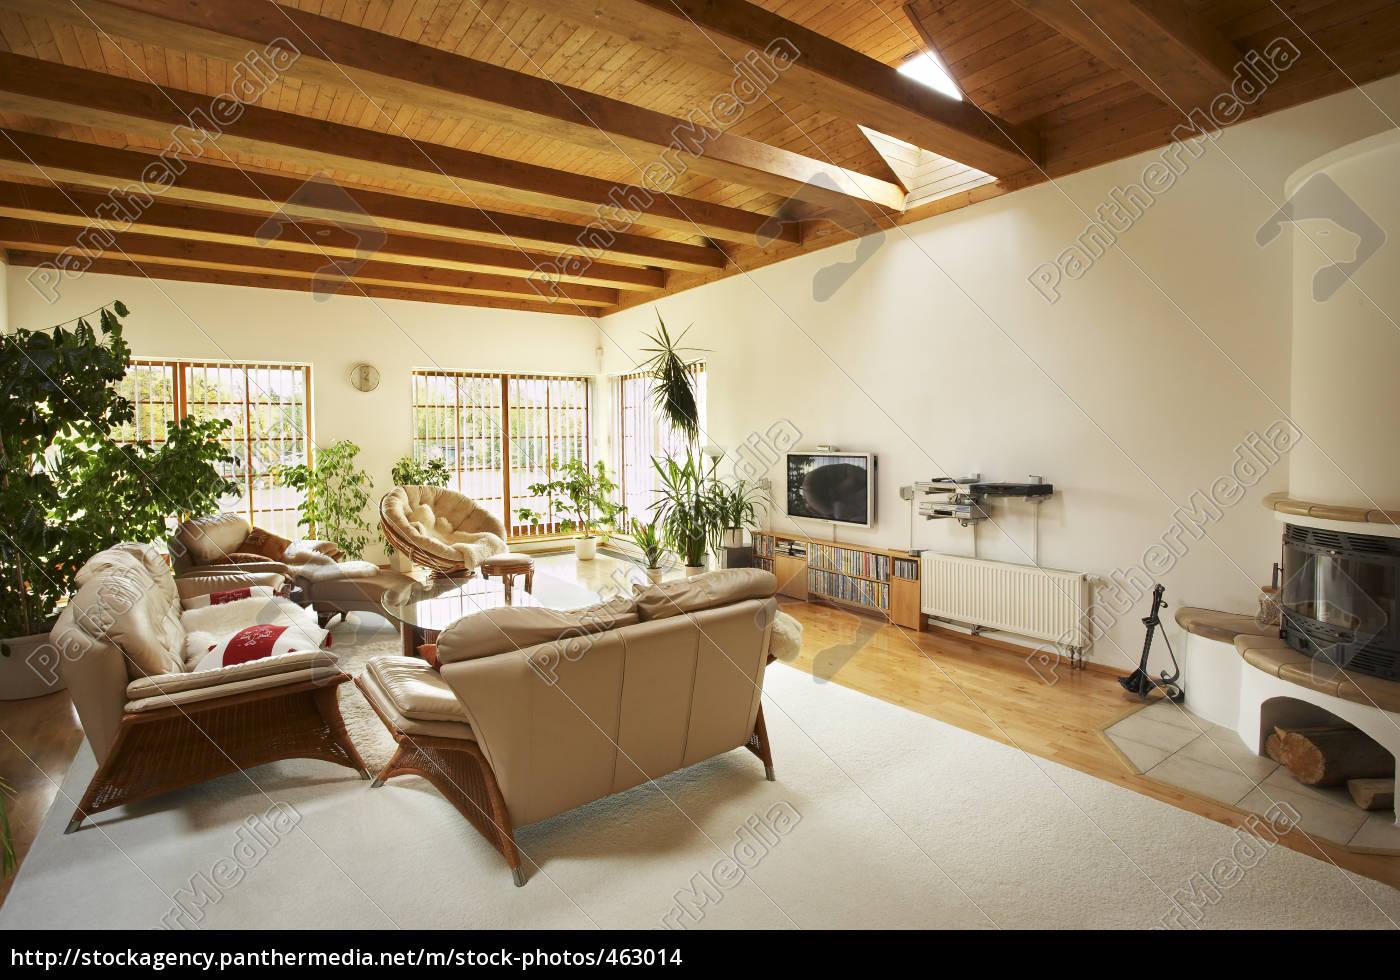 living, room - 463014